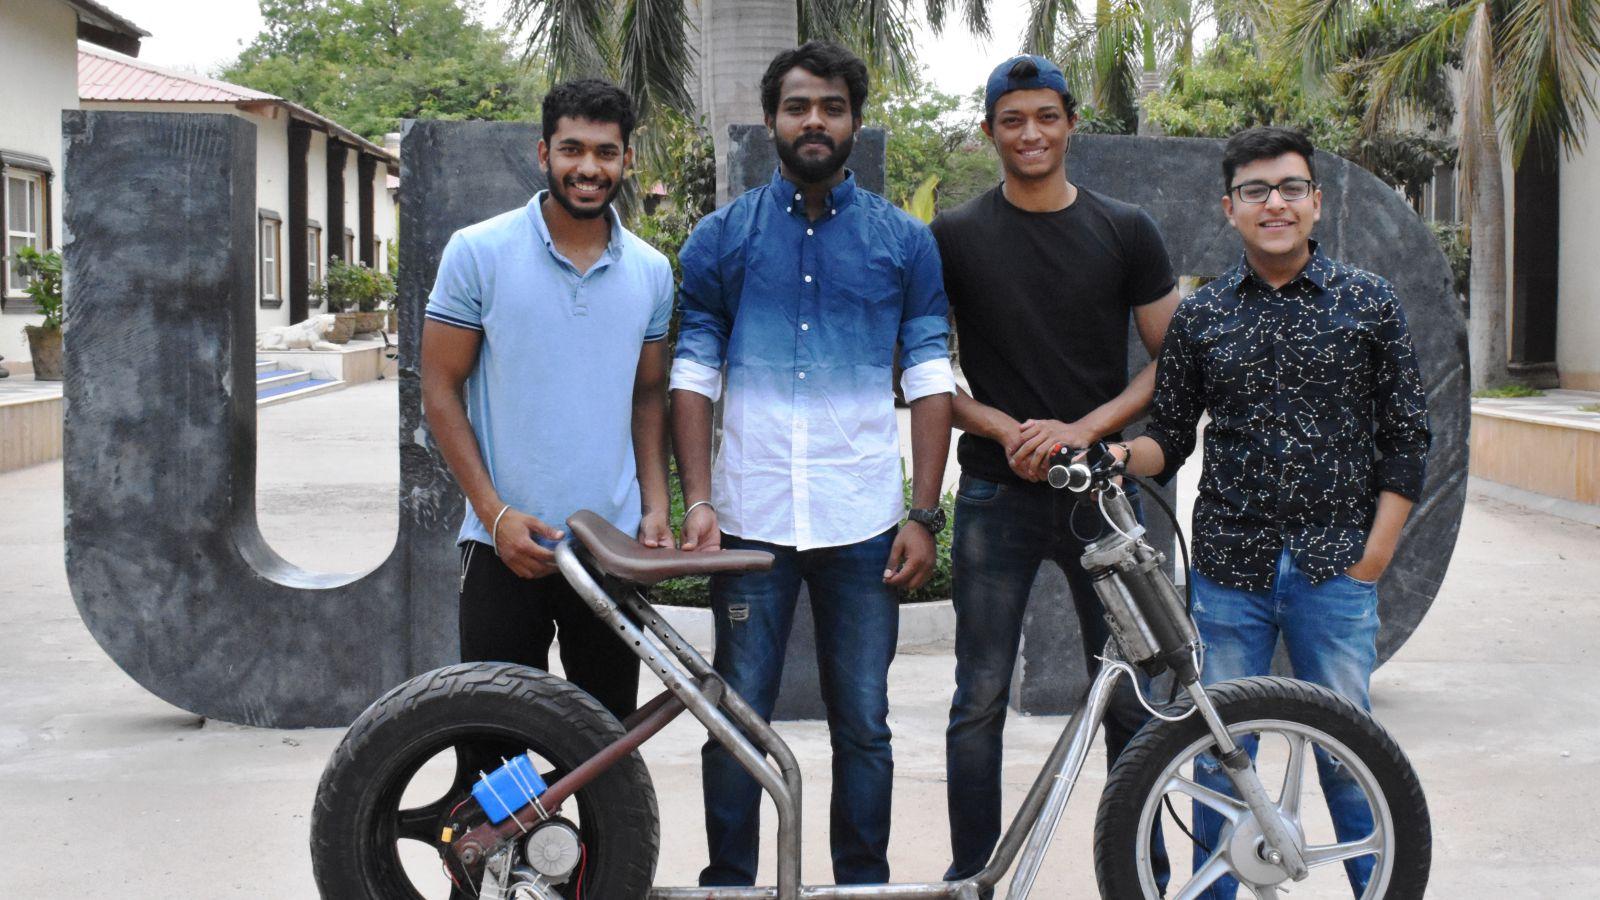 e-Bike designed by UID students Image